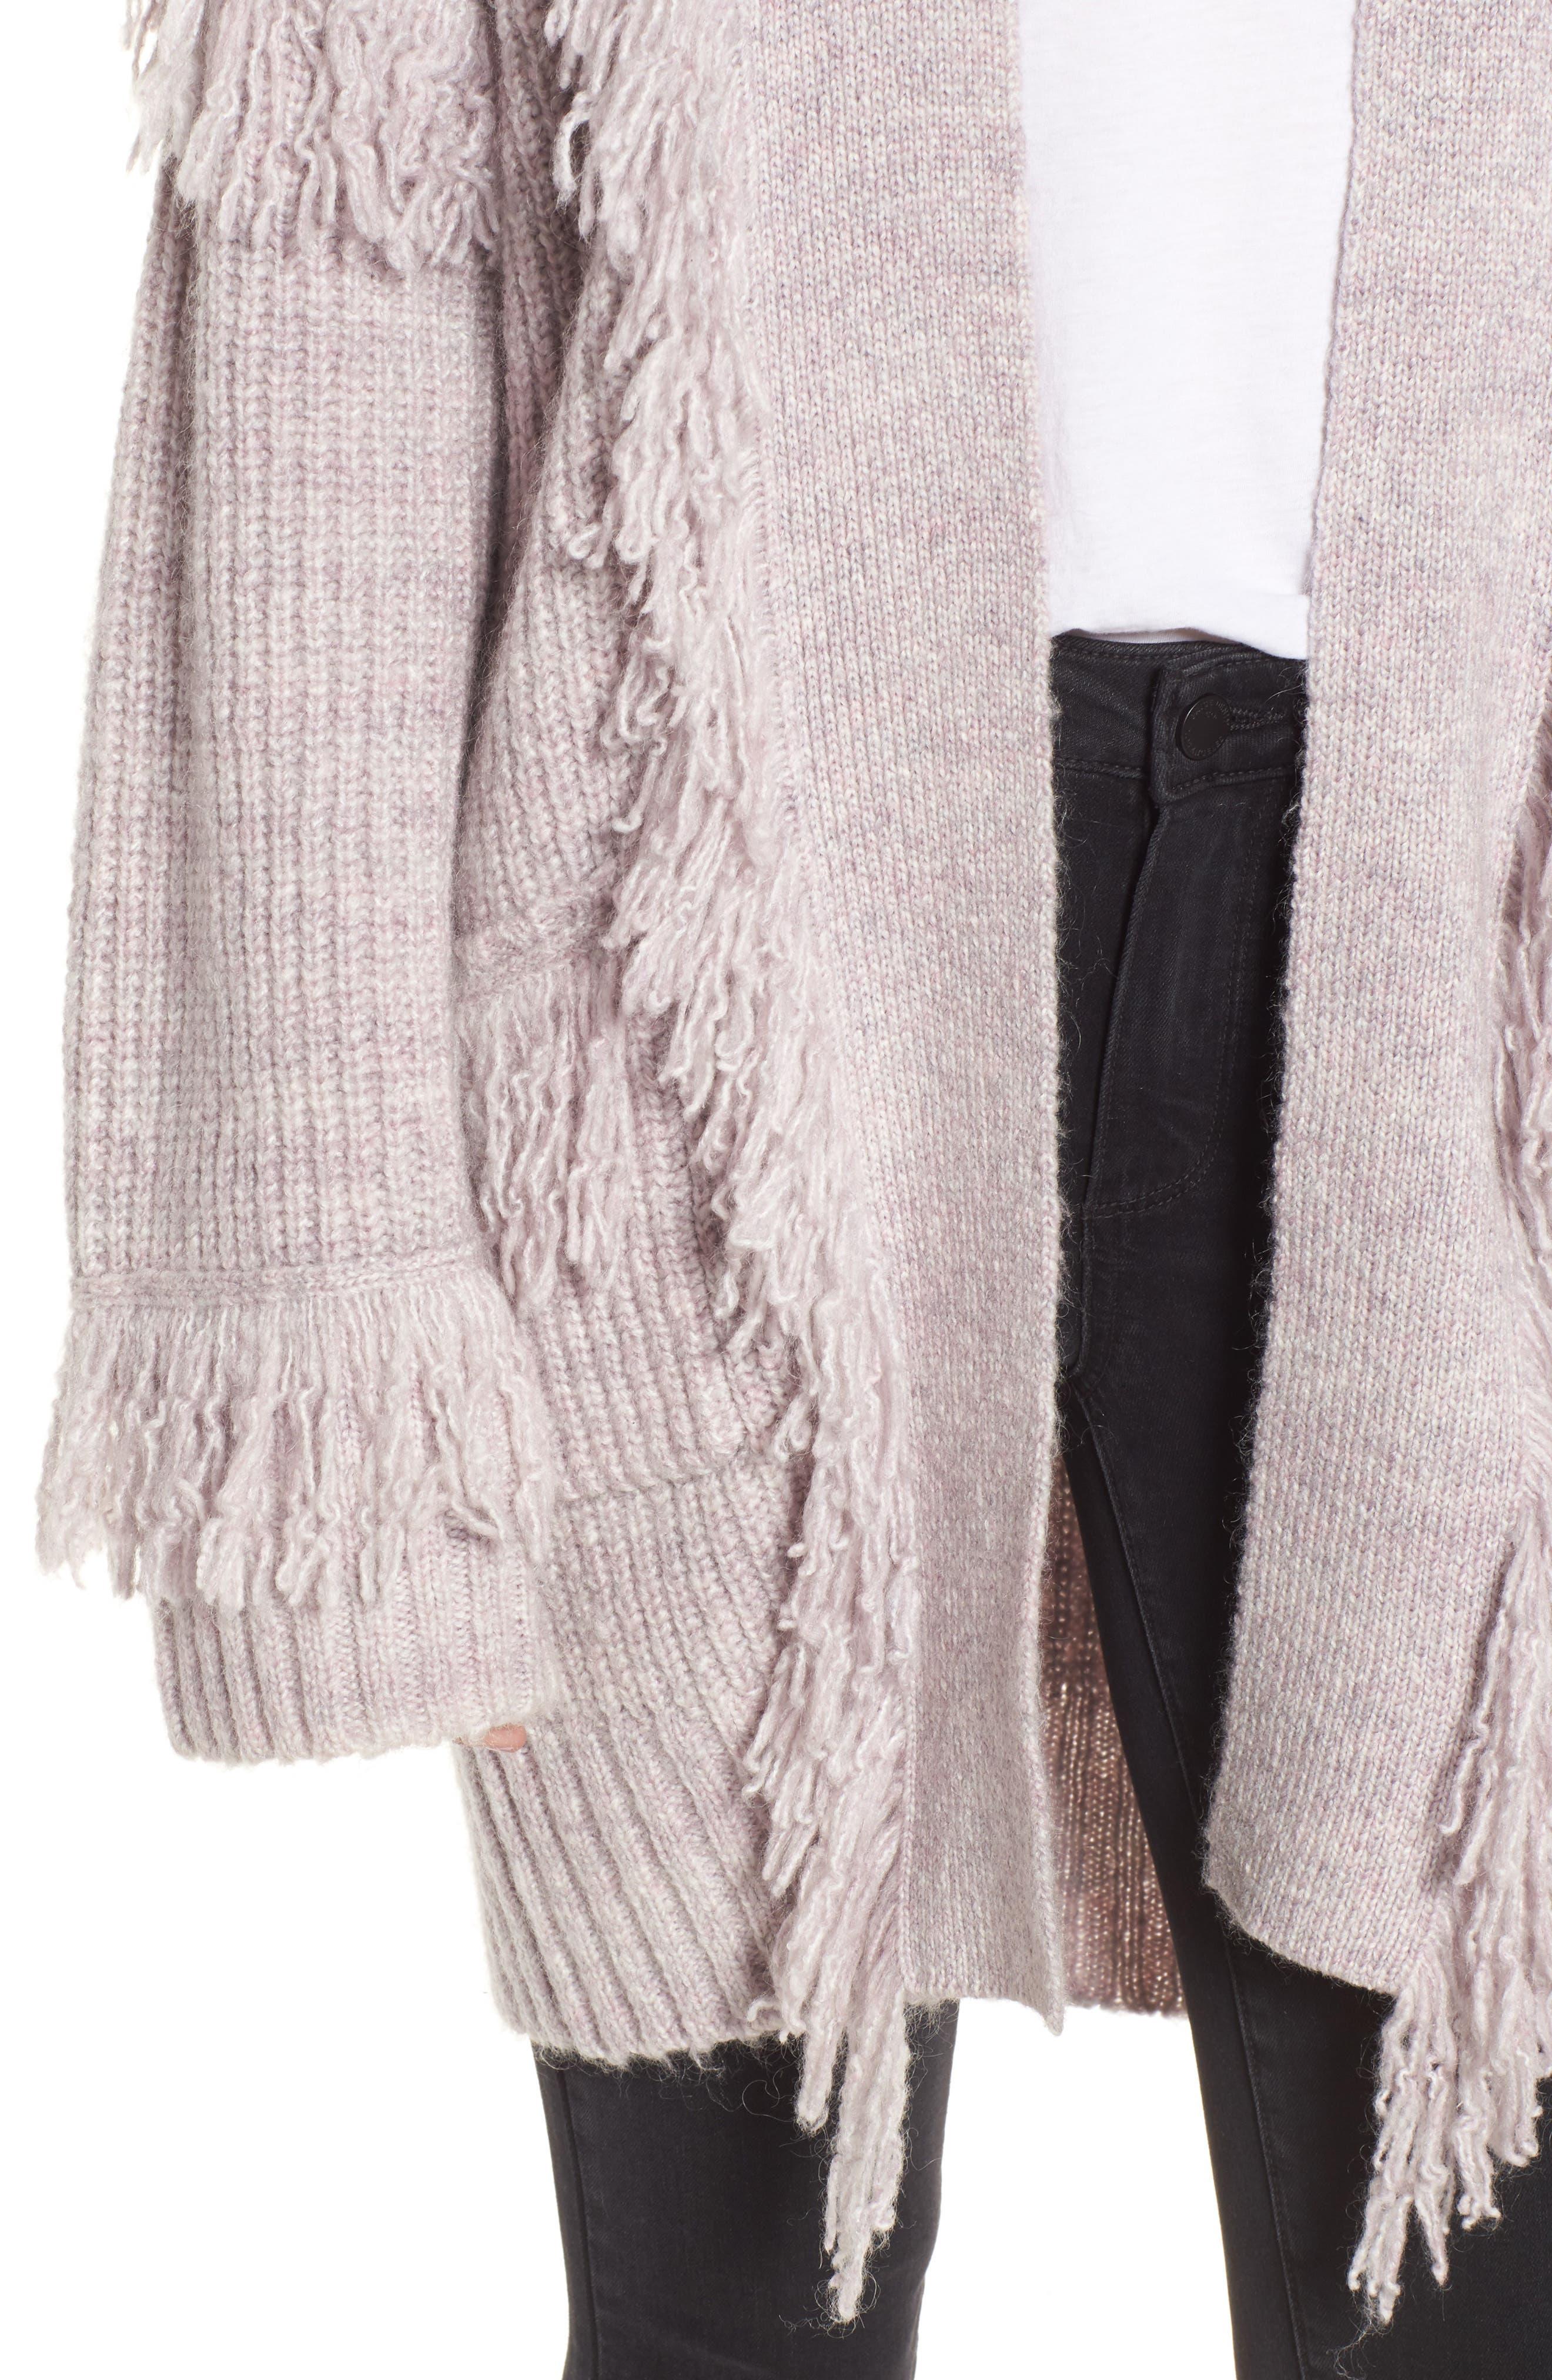 Berea Fringe Cardigan Sweater,                             Alternate thumbnail 4, color,                             684